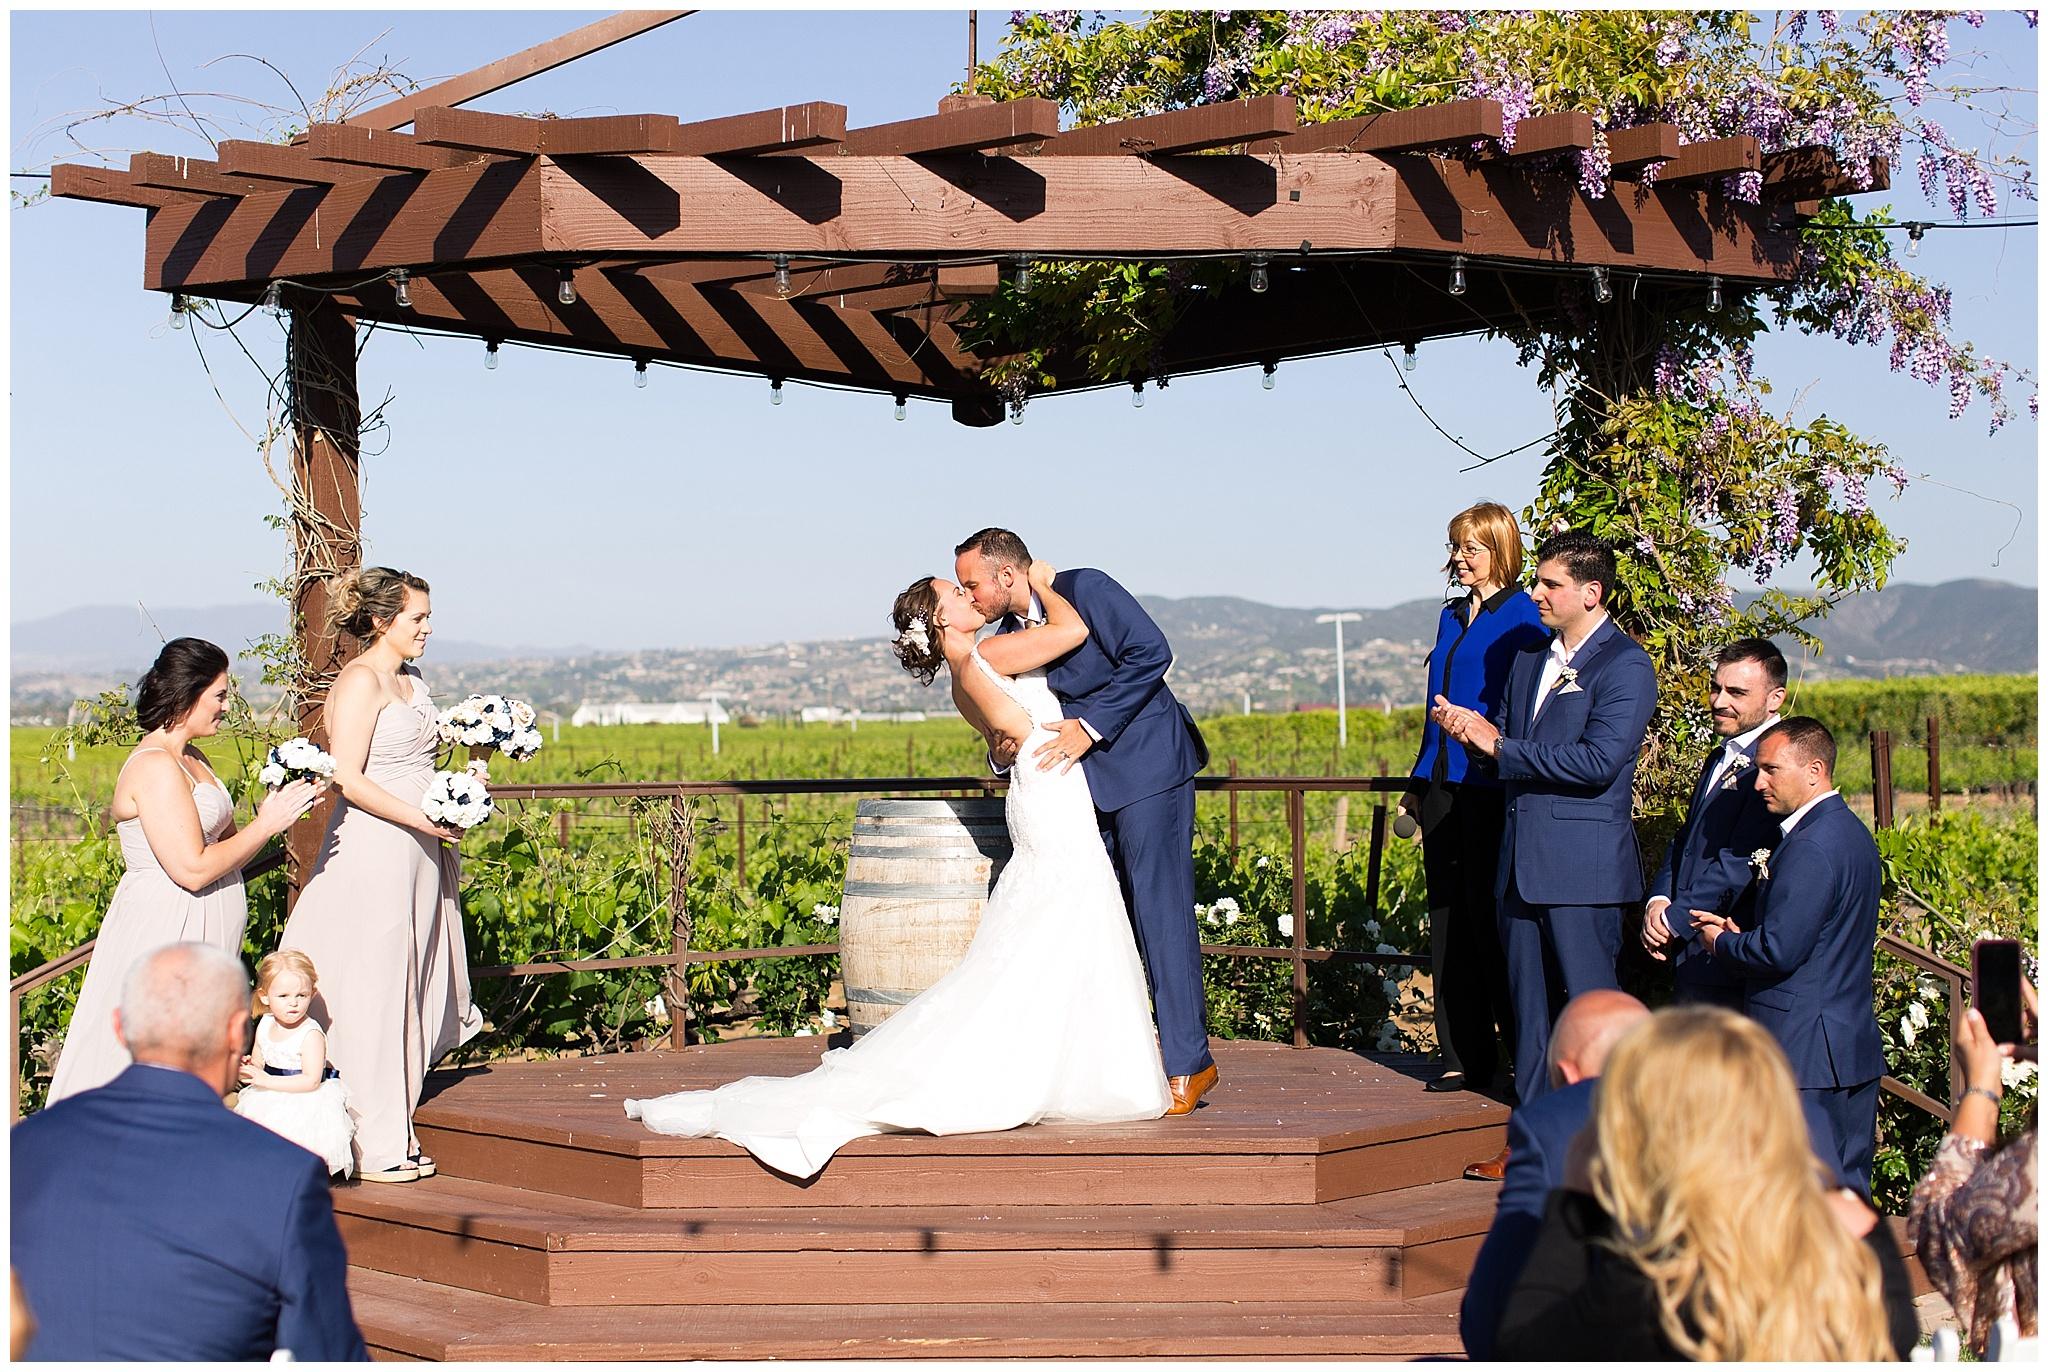 Vinny-Cayt-Wedding-04-26-18-1433.jpg